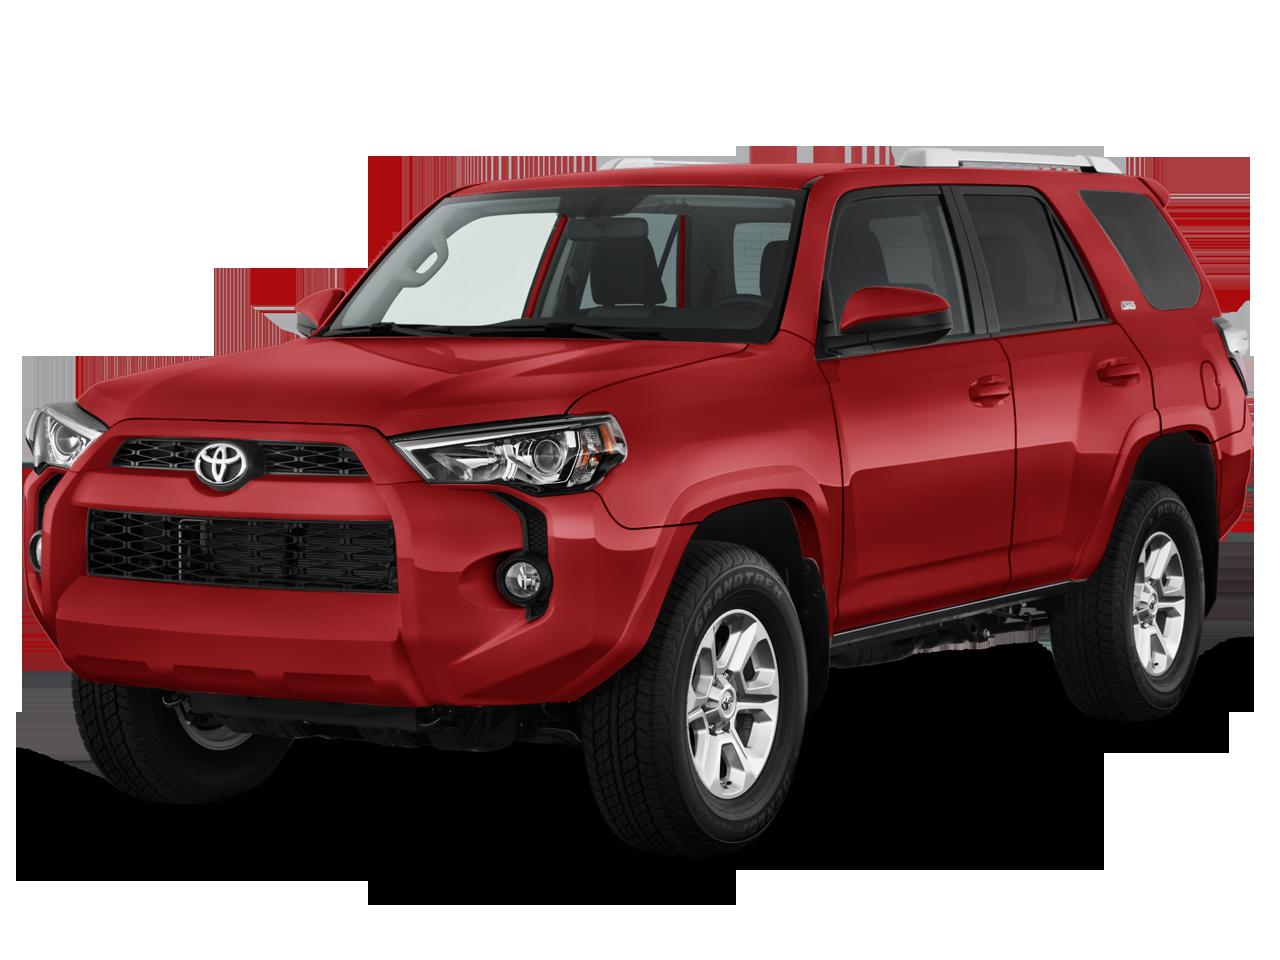 Toyota Highlander Service Manual: Symptom simulation